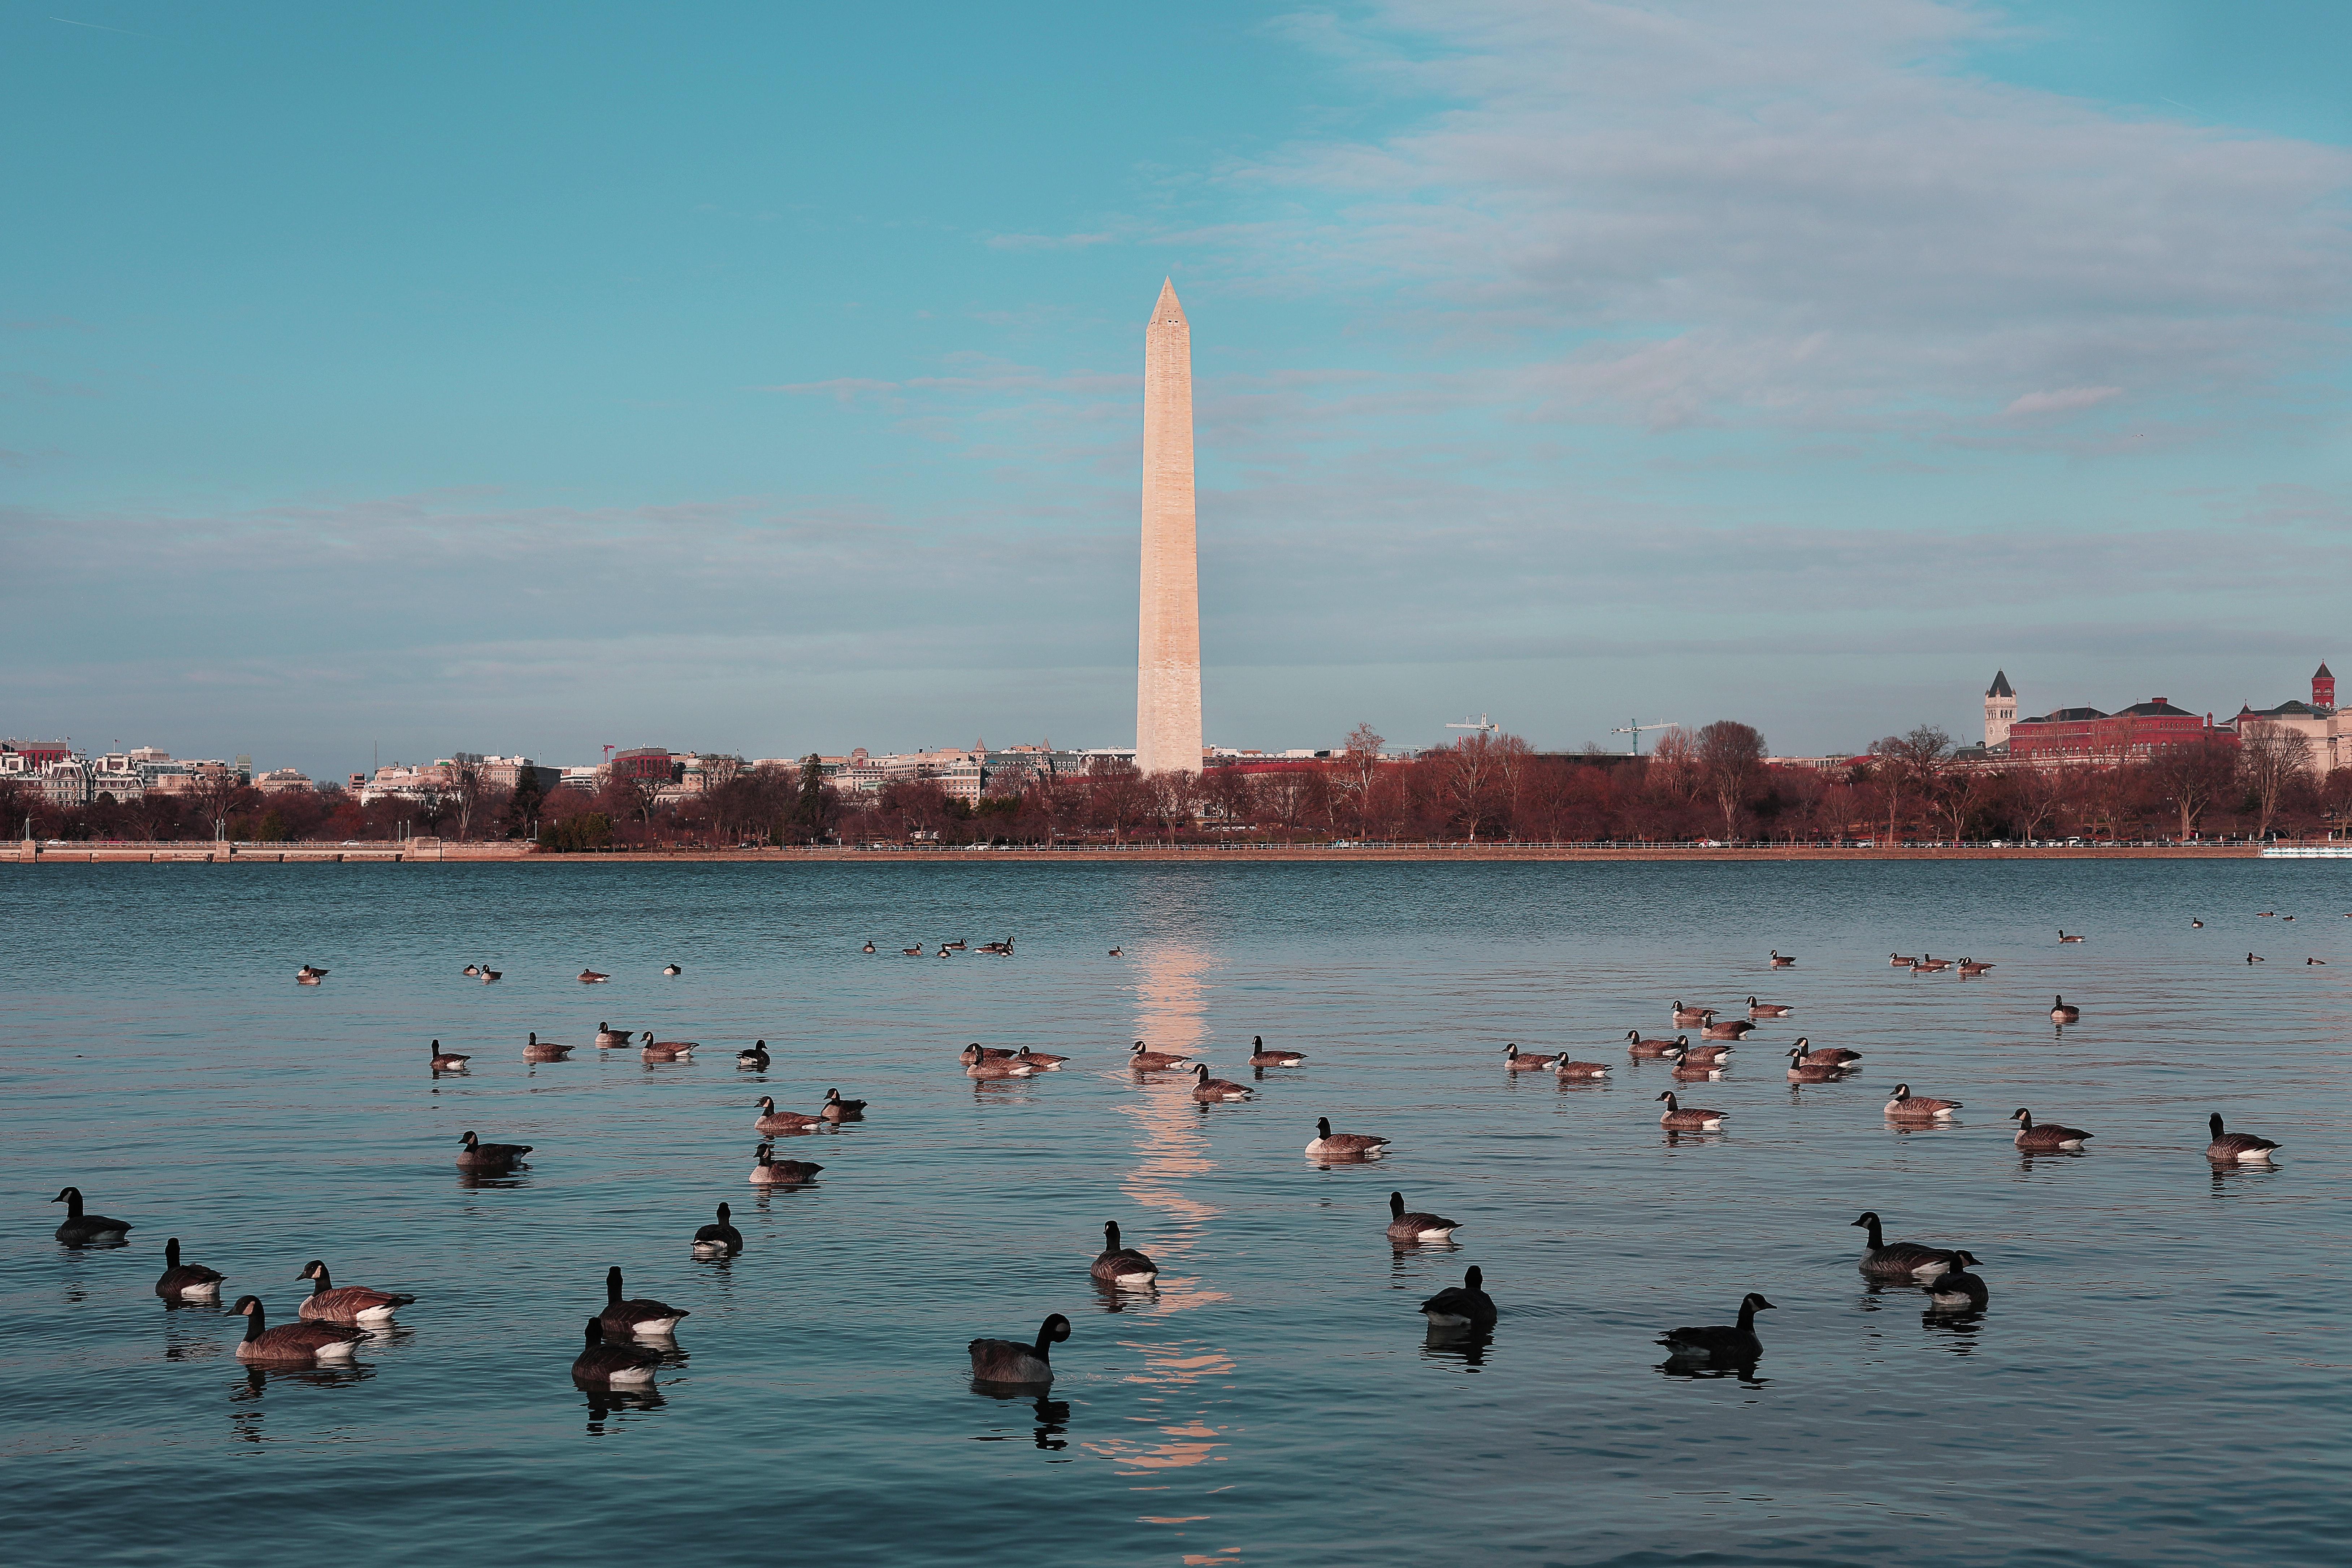 Washington Monument, USA, Animals, Reflection, Waterfront, Water, HQ Photo